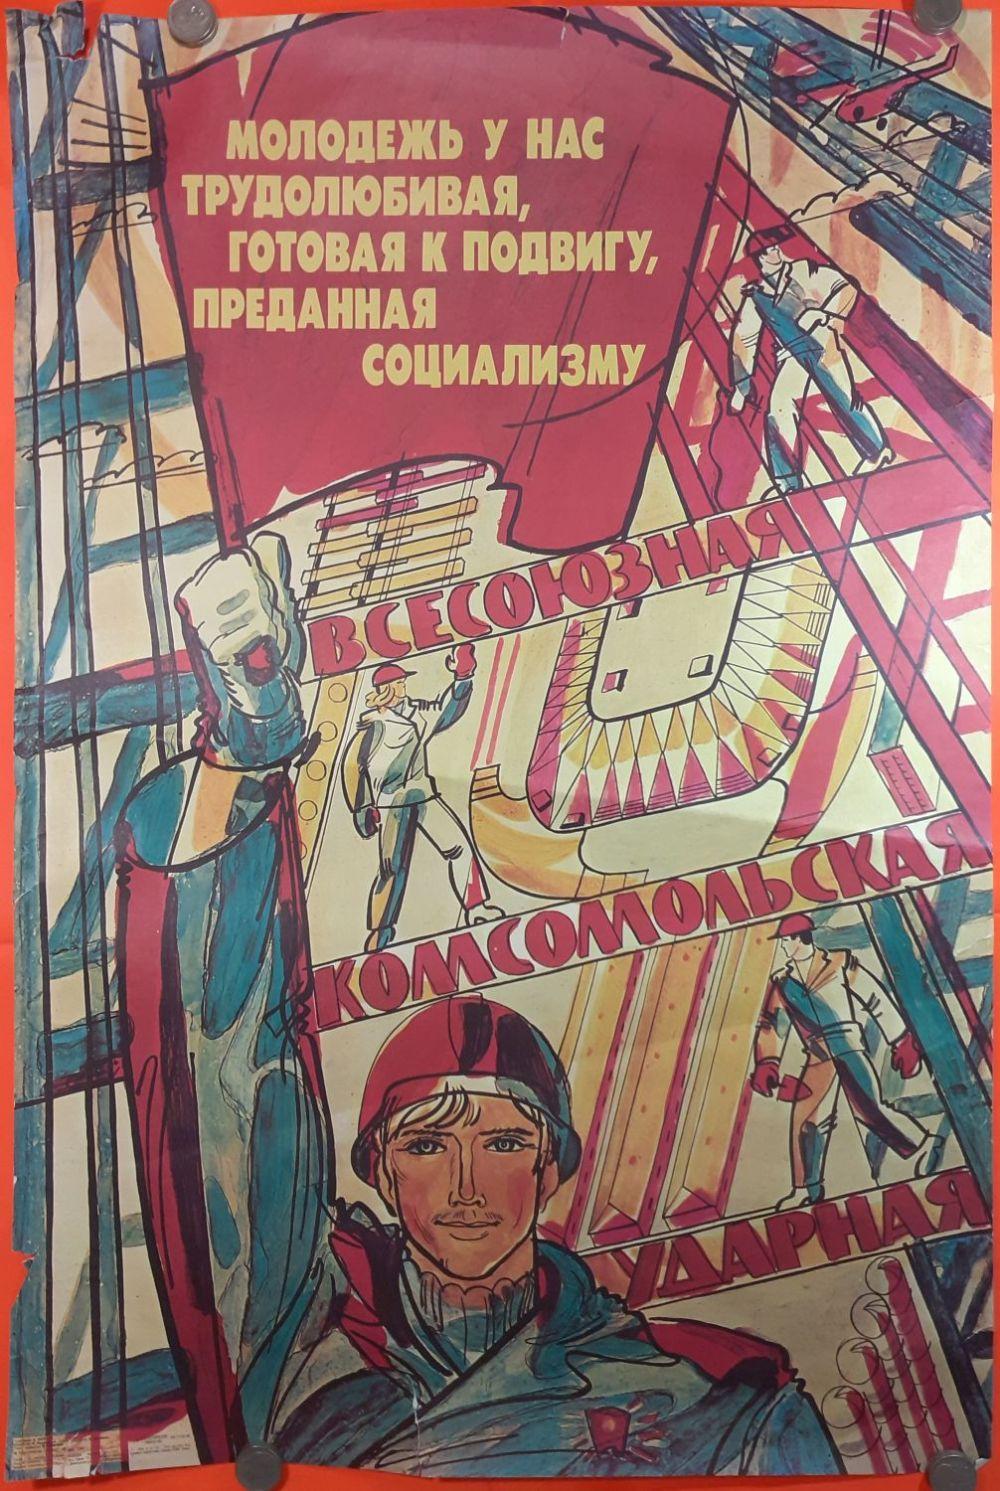 Victor Konstantinovich Vourrin. All-Union, Komsomol, shock!